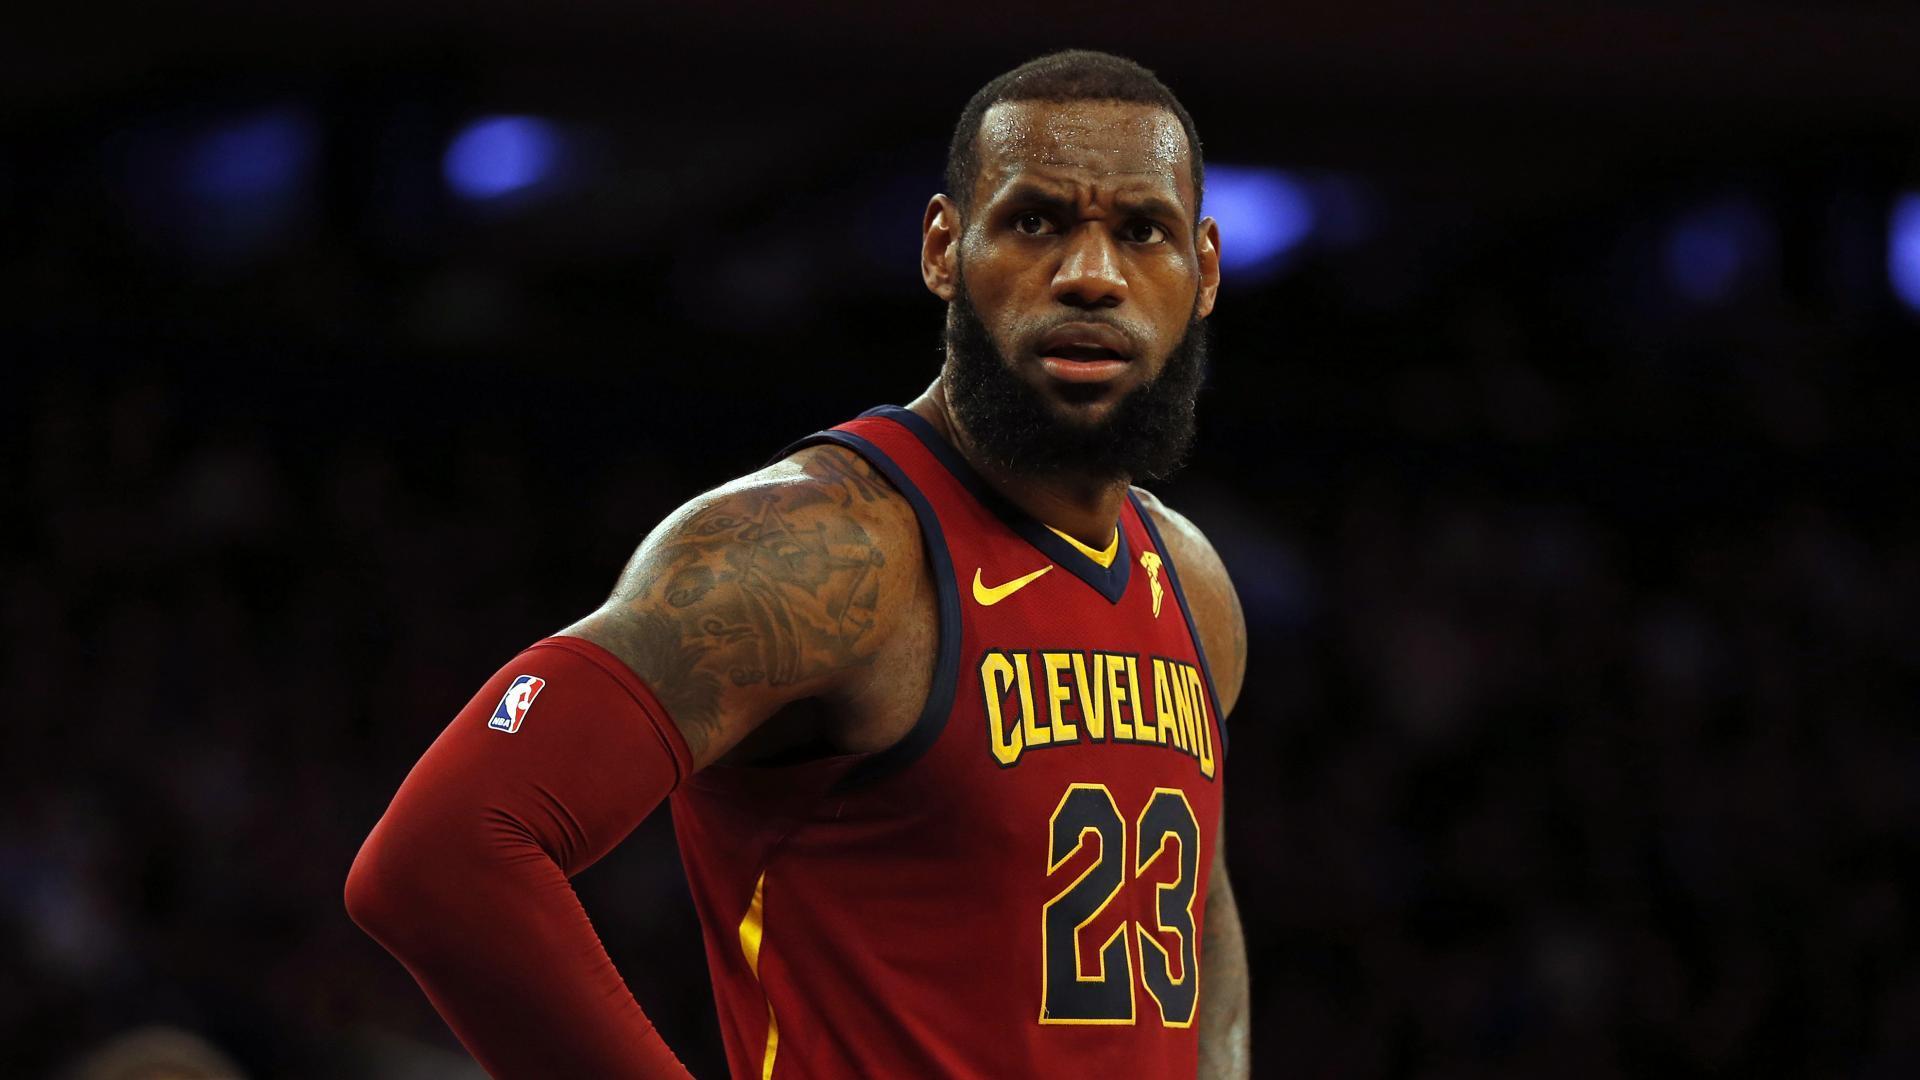 LeBron James, seal, $154 million, deal, Los Angeles Lakers, Sports, Basketball, NBA, Newsmobile, Mobile News, India